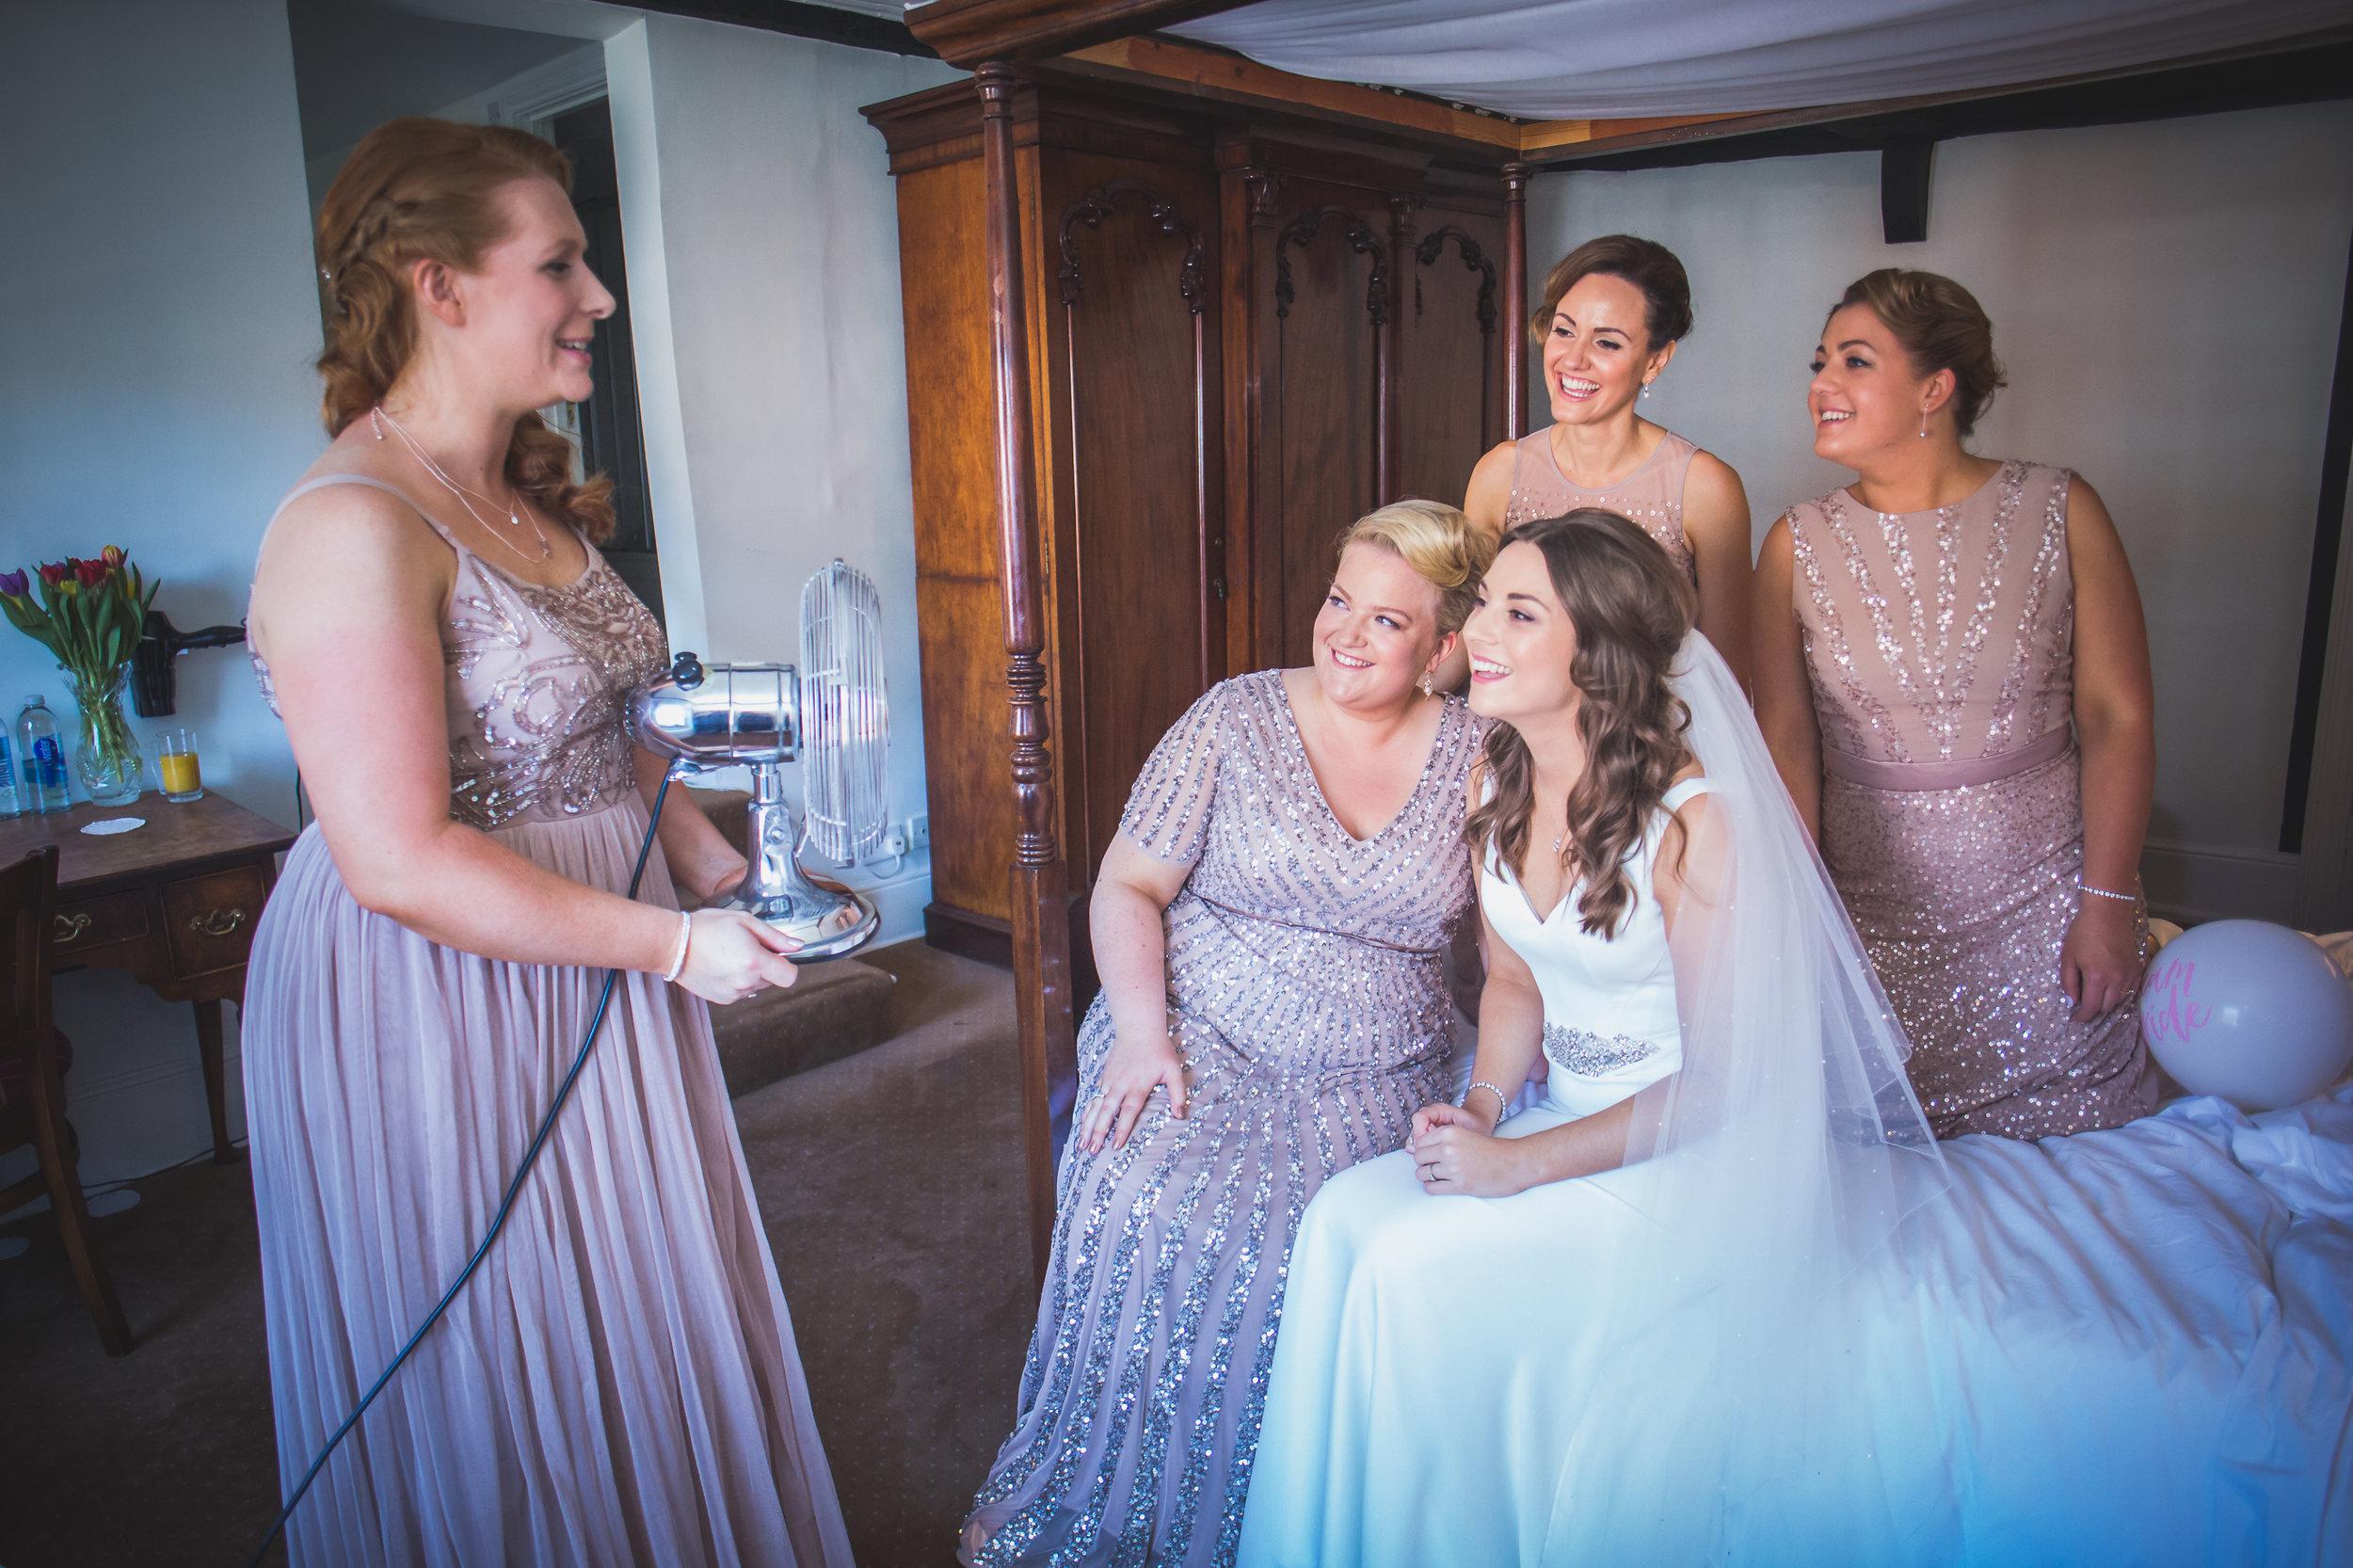 Grittenham Barn female wedding photographers west sussex petworth social-28.jpg